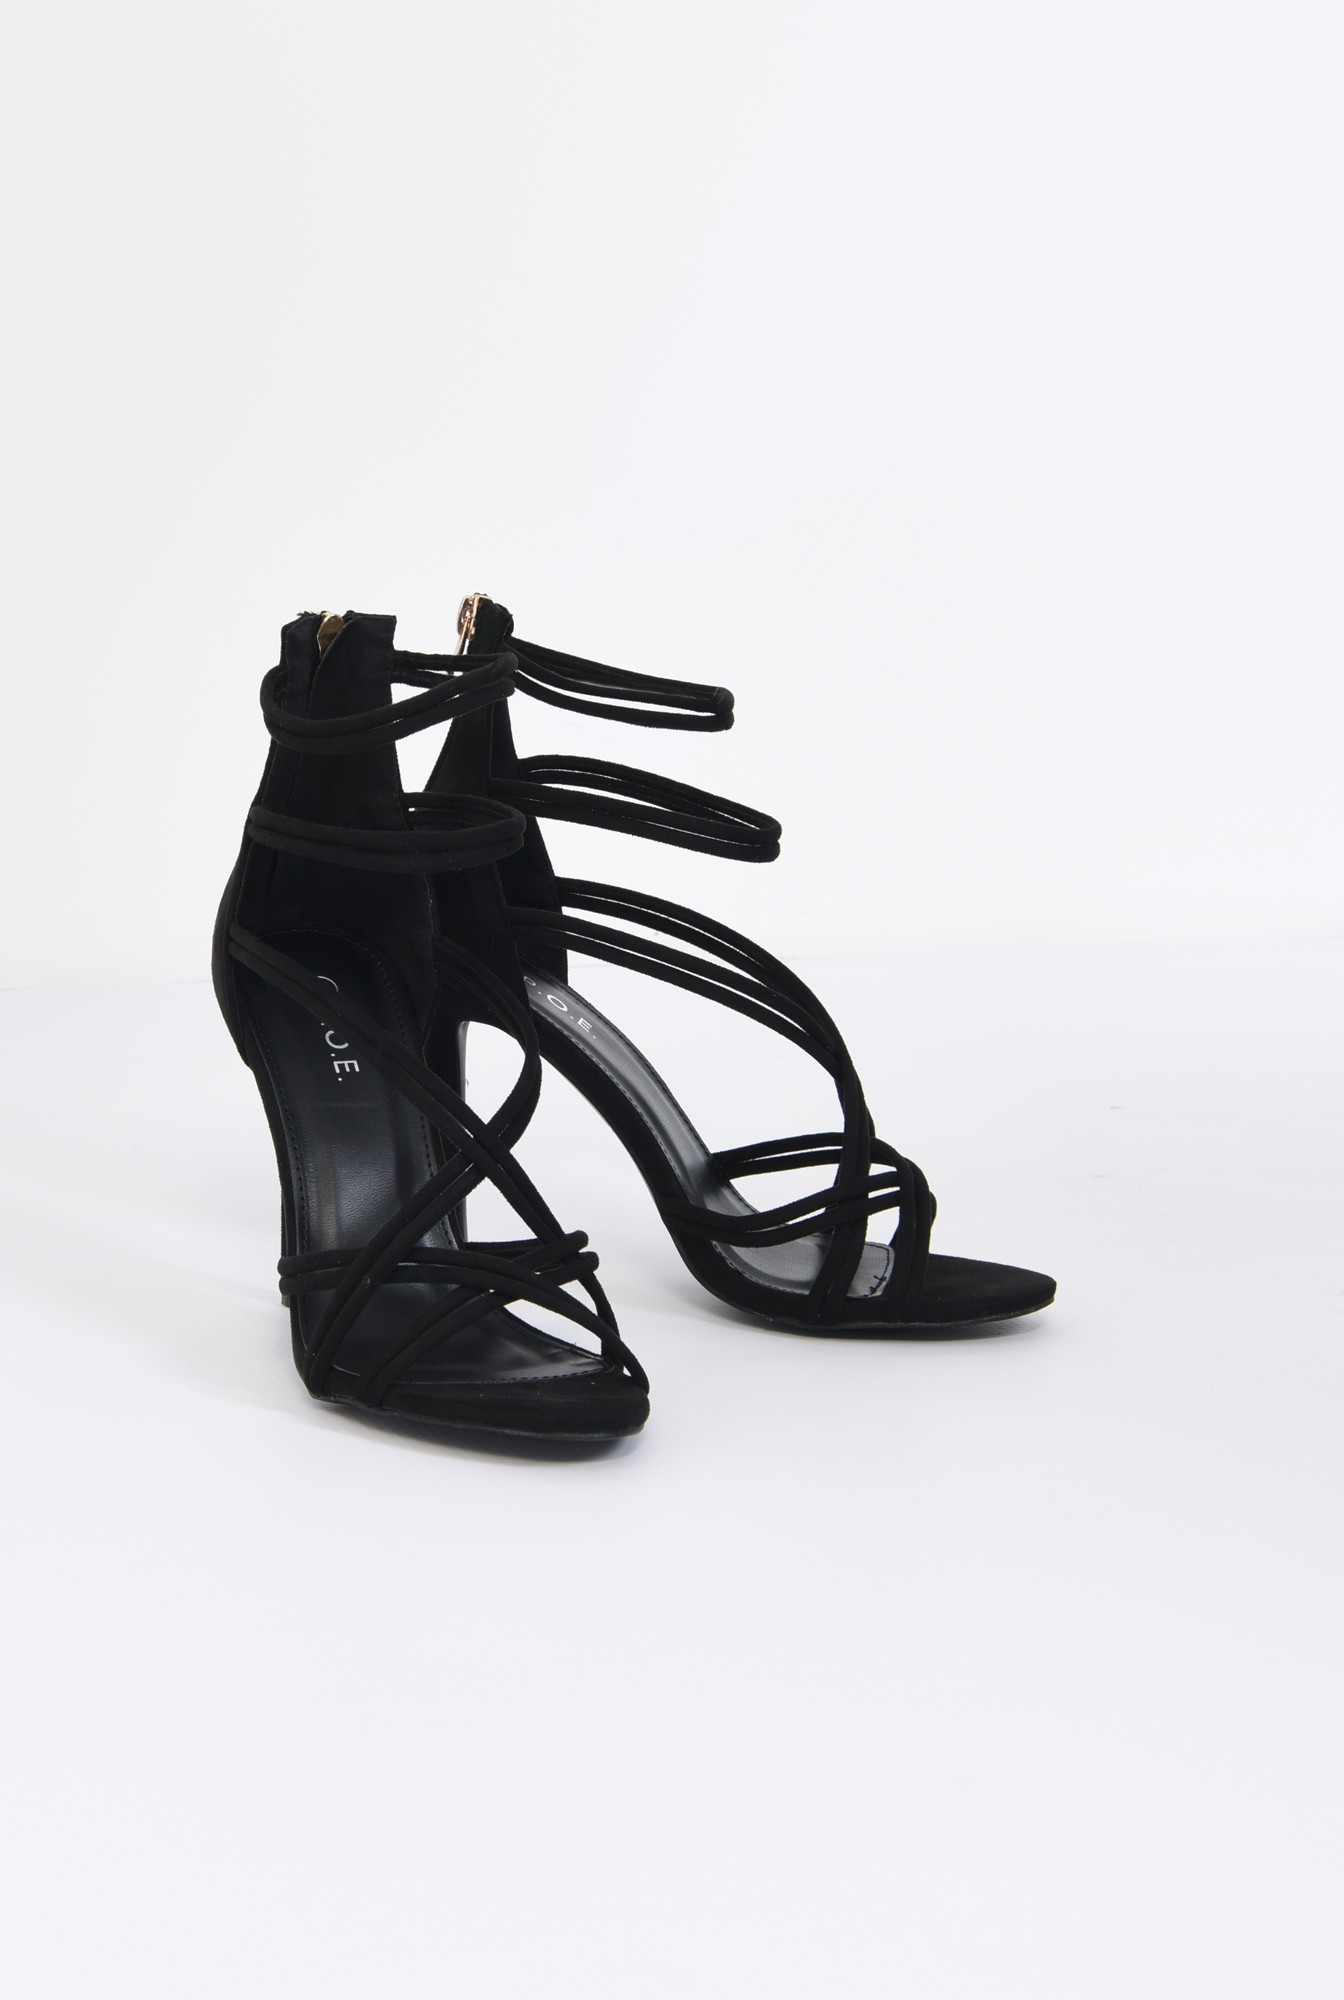 3 - sandale elegante, negre, catifea, stiletto